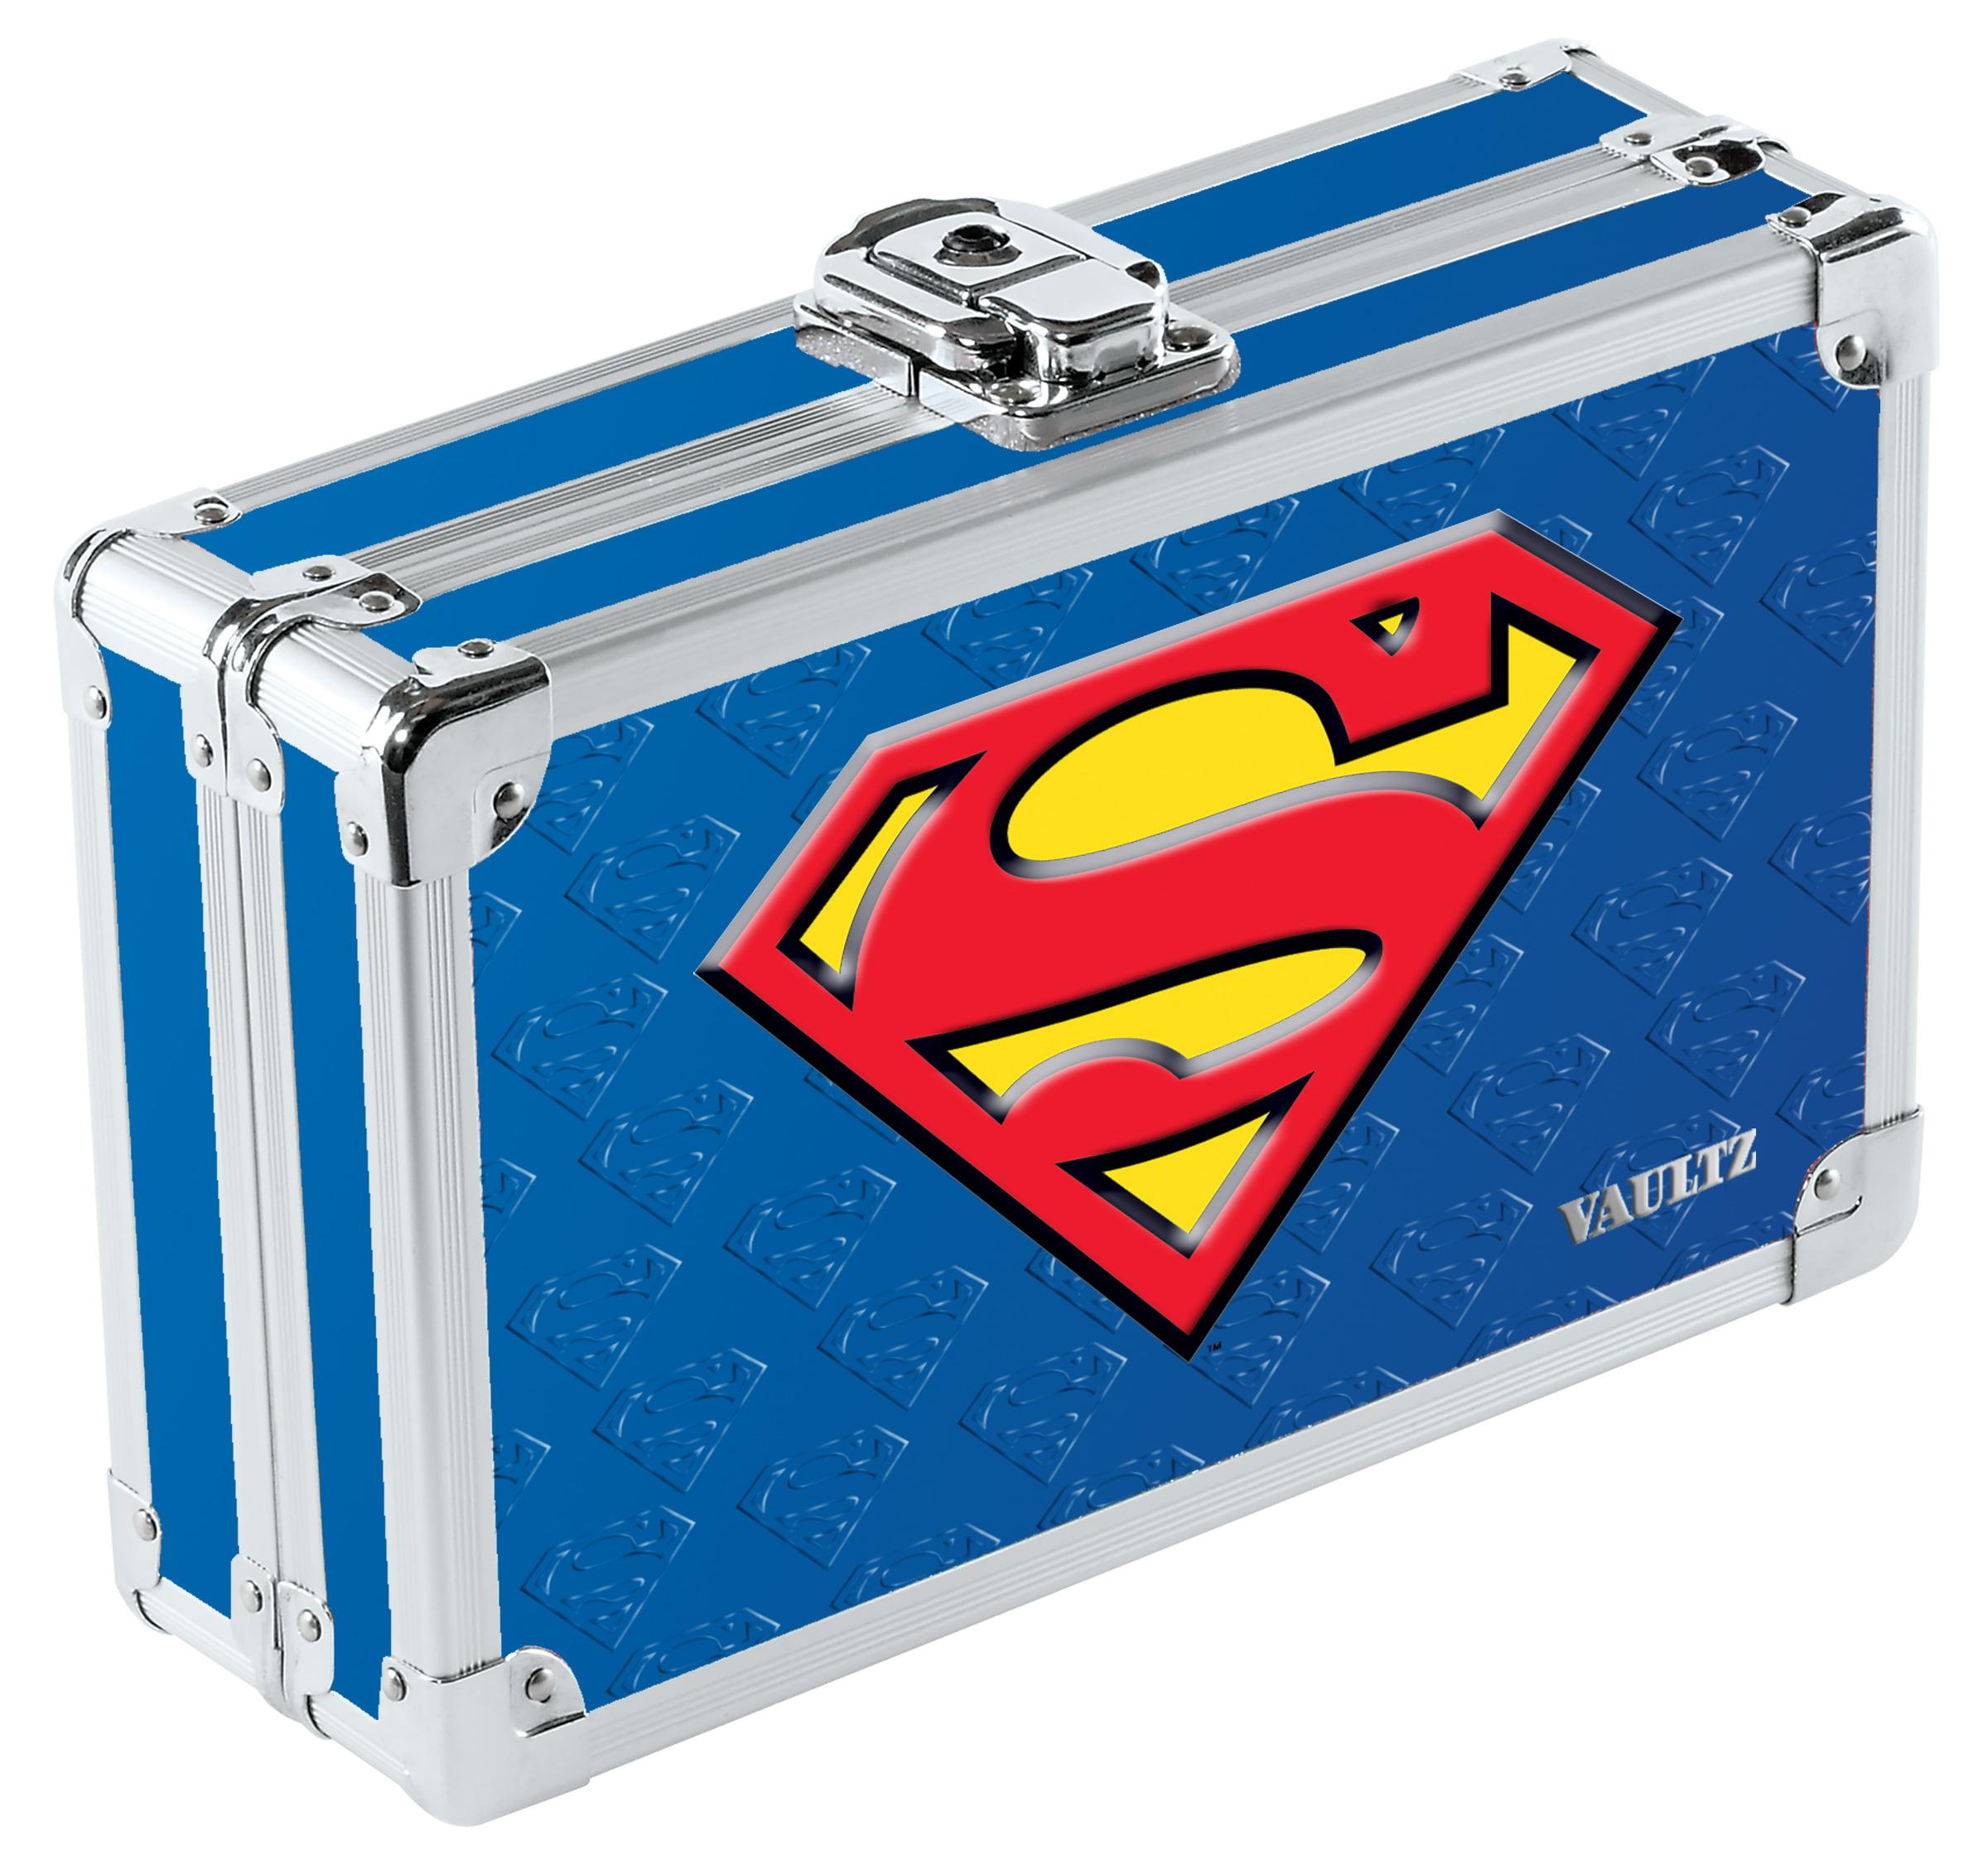 Vaultz Pencil Box - Blue Superman